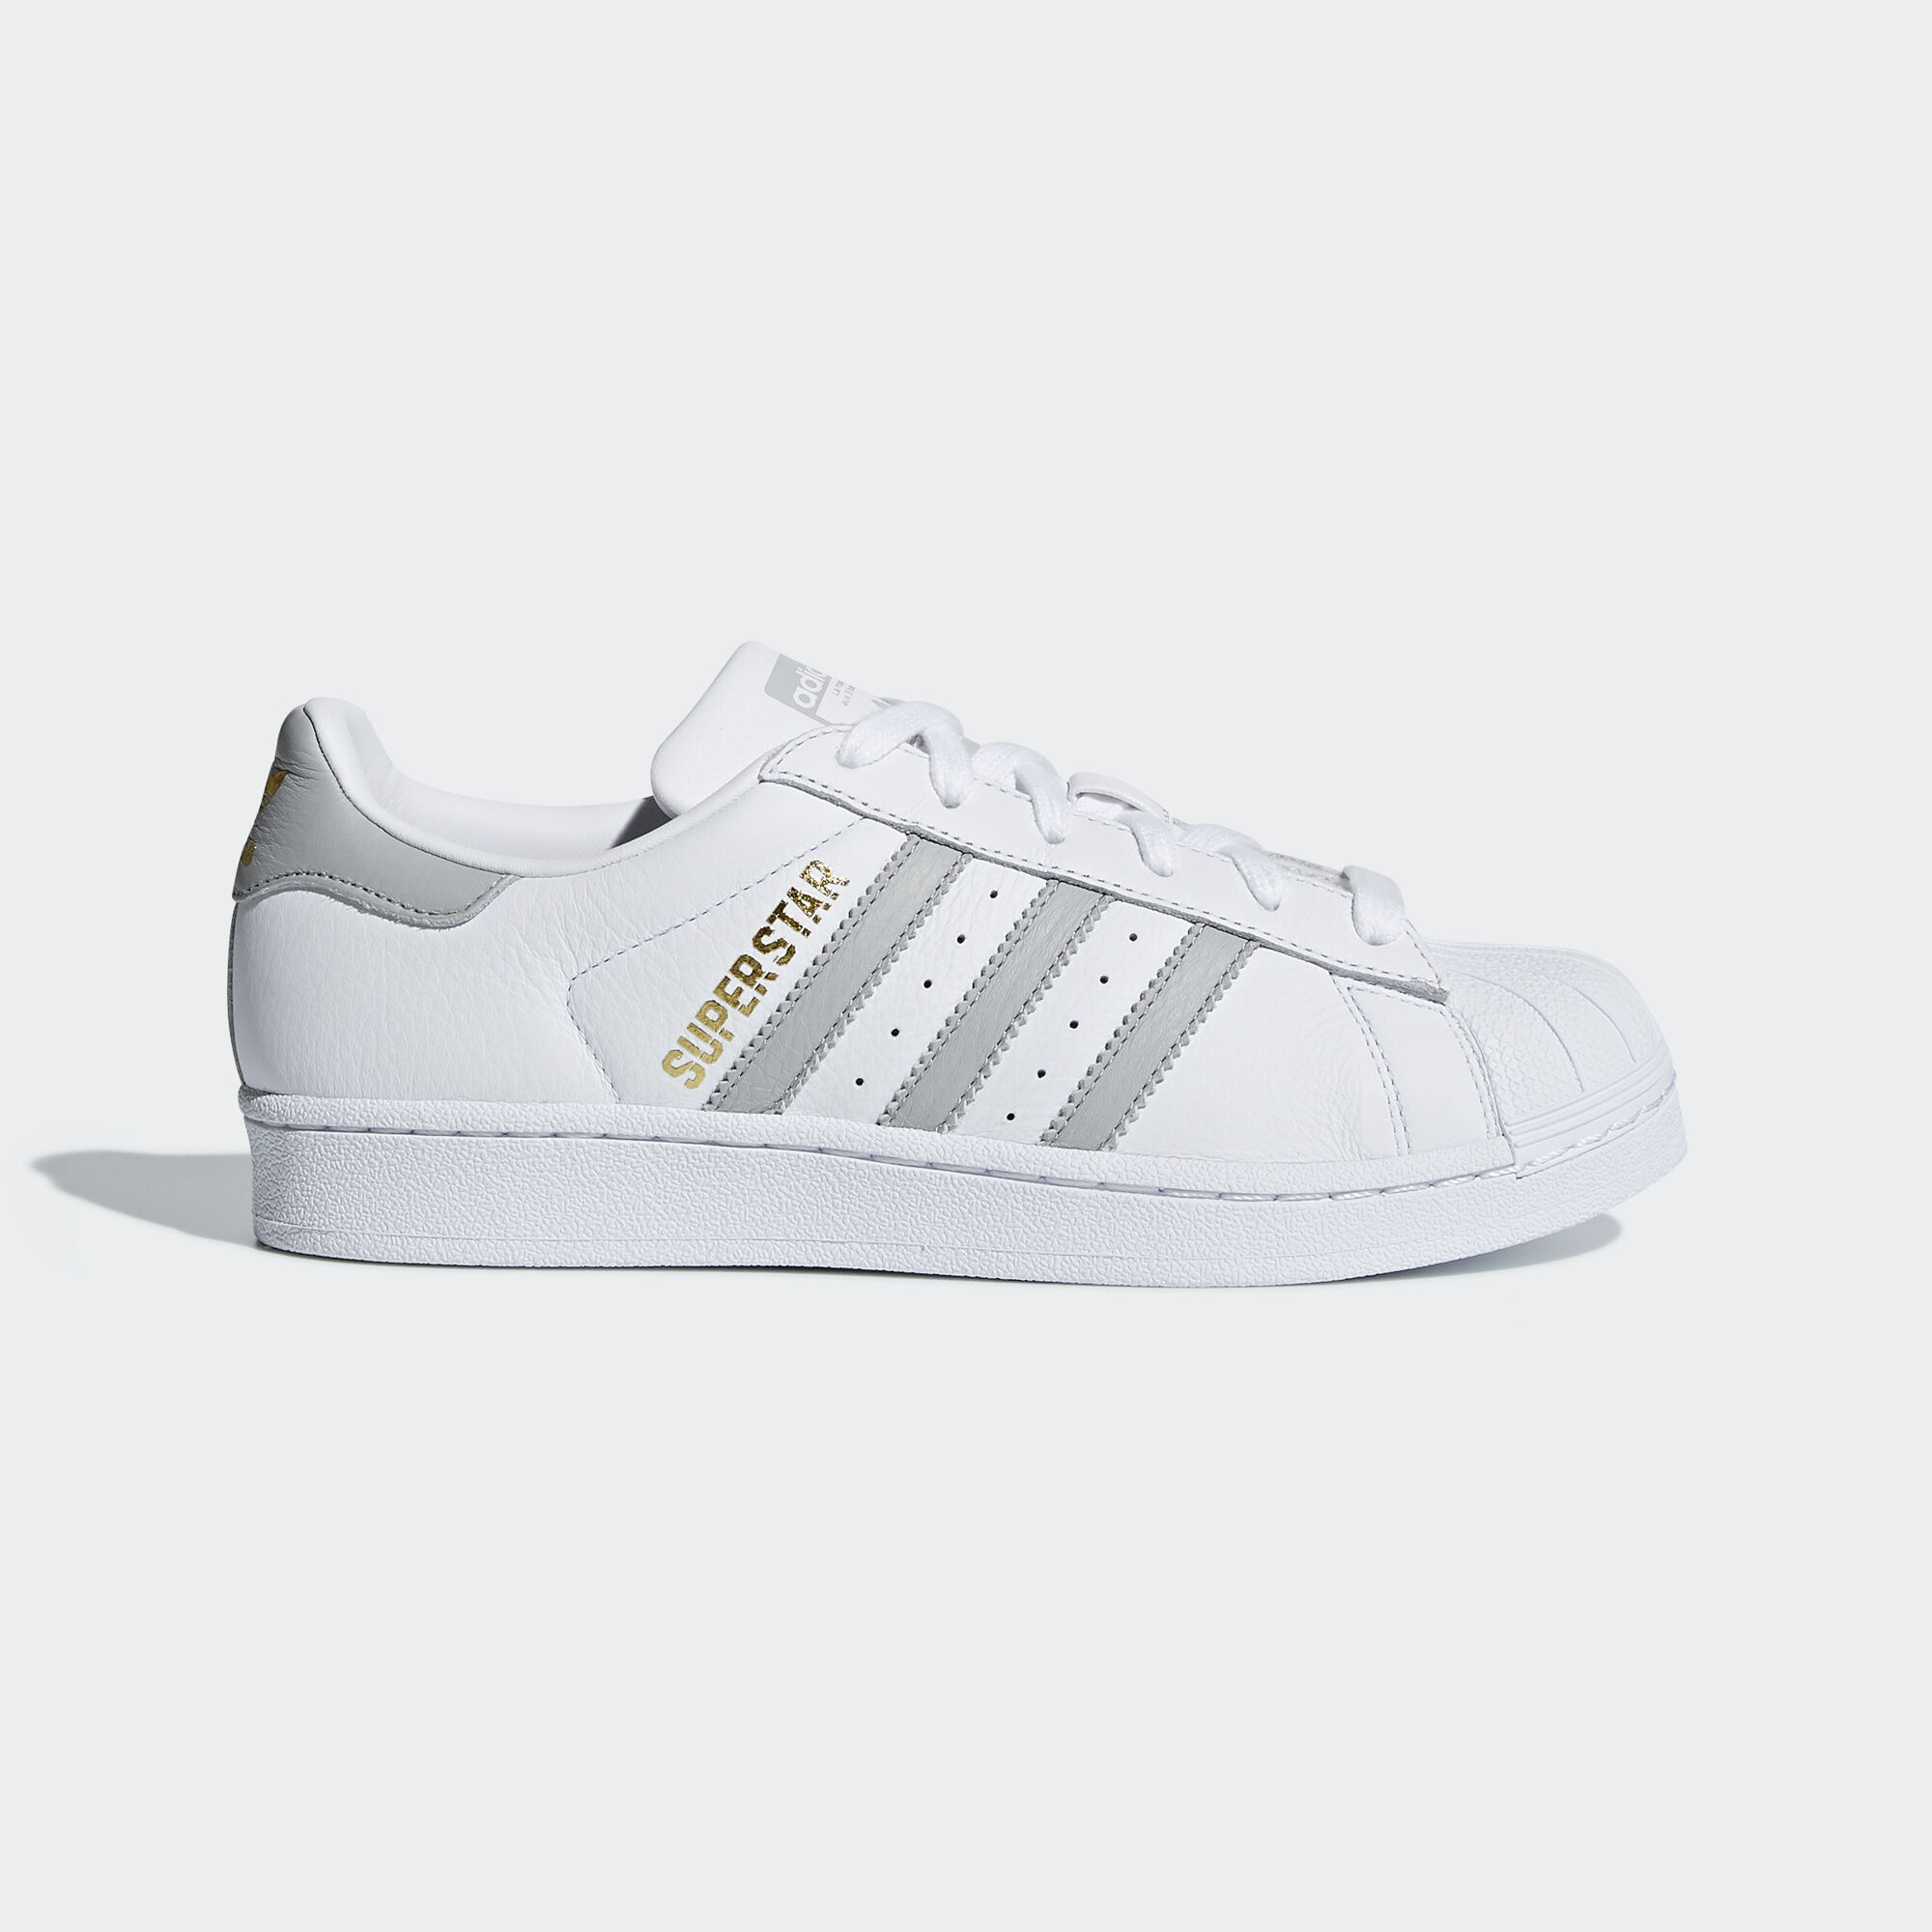 greece adidas superstar grey shoes 18d30 1bfef